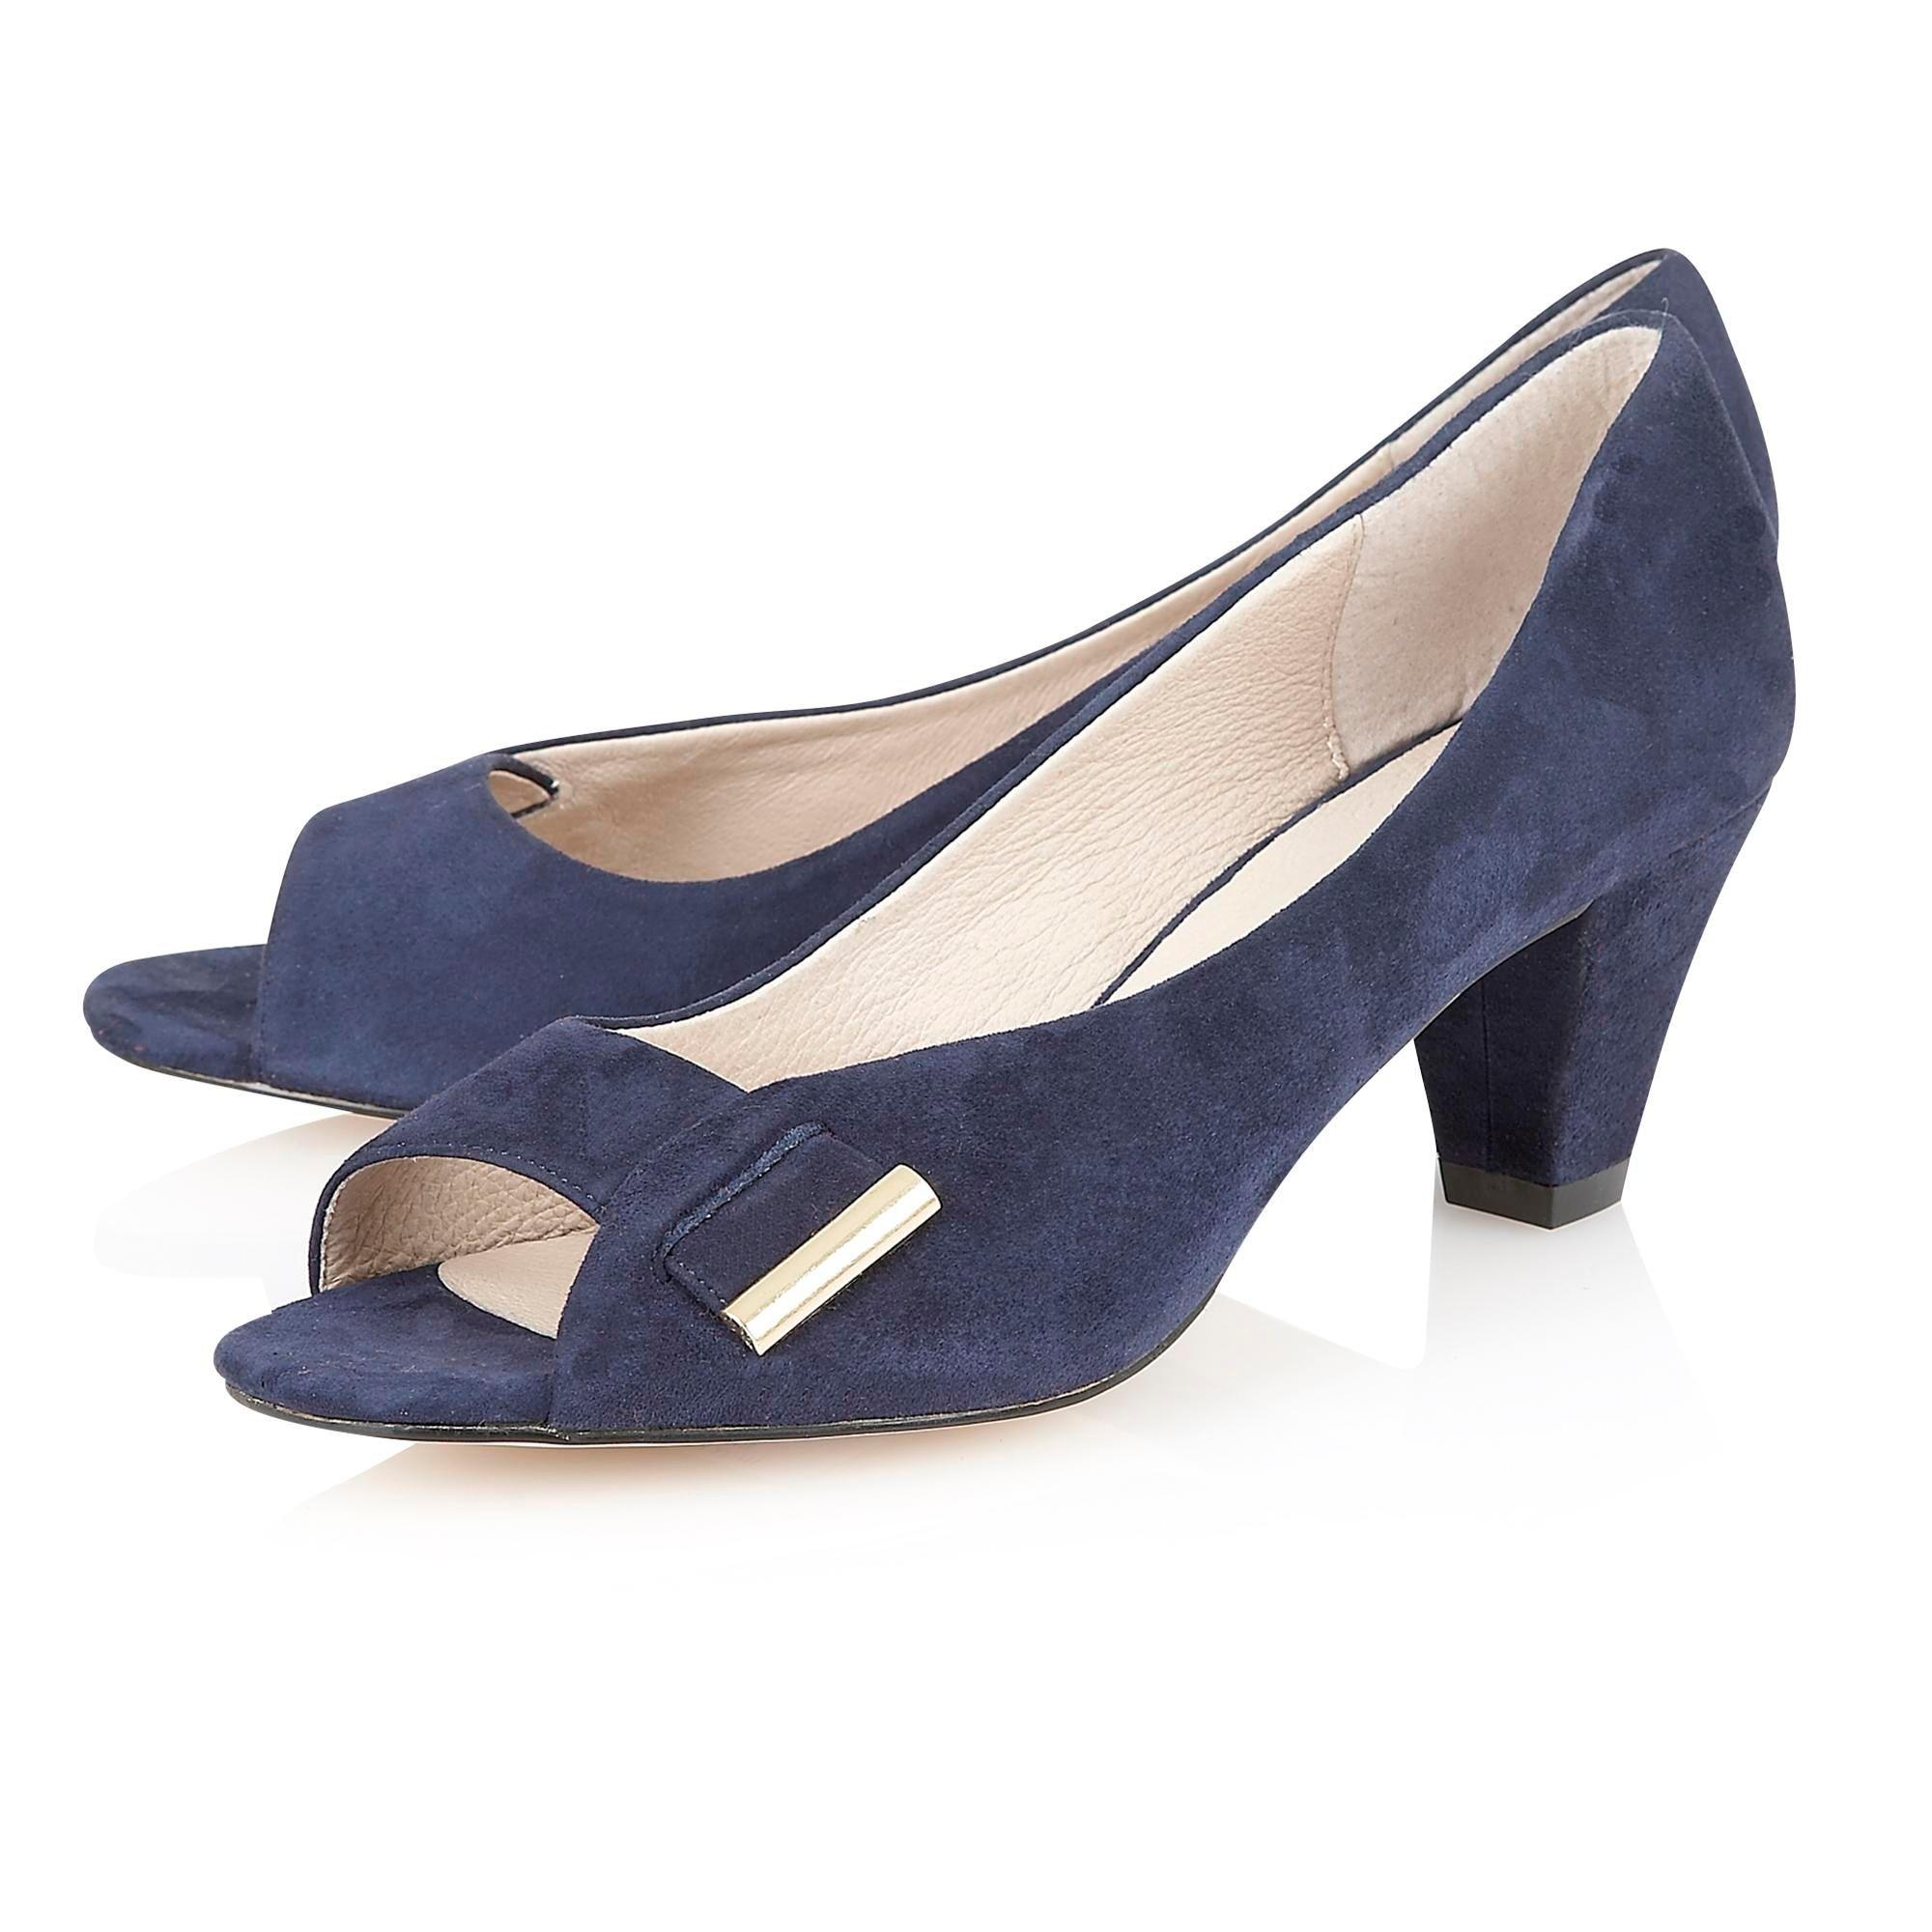 Armani Shoes Uk